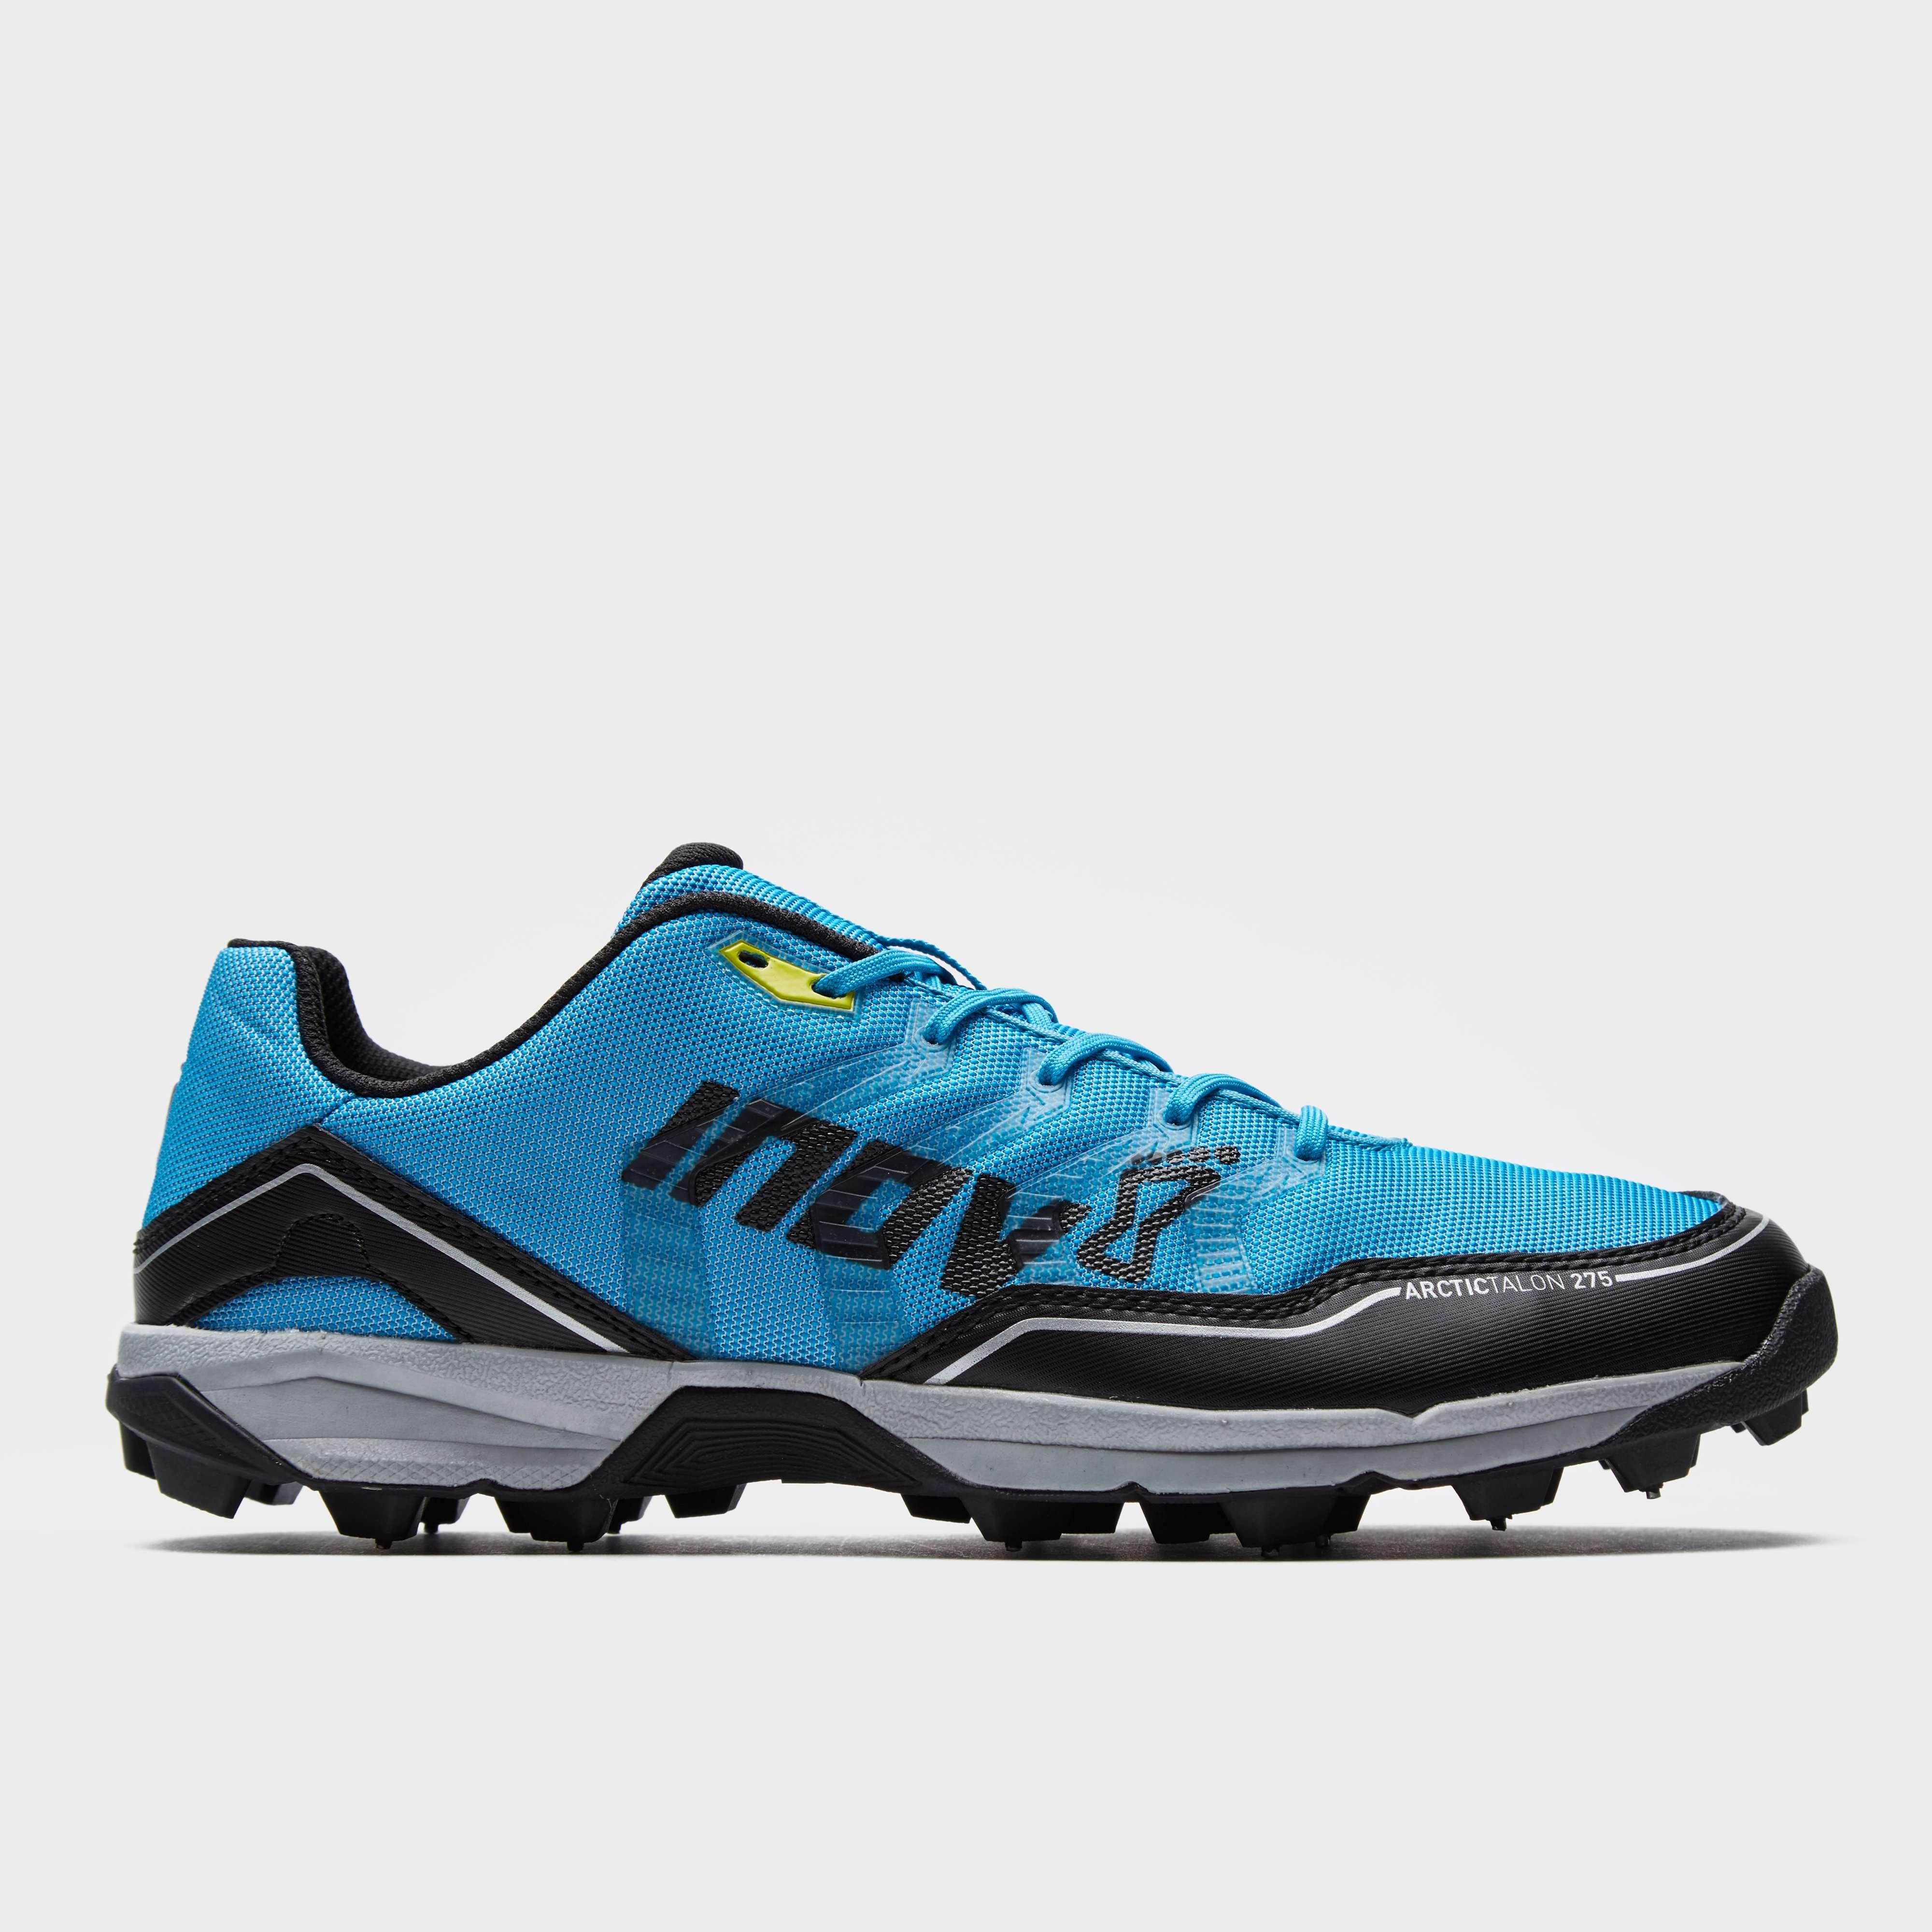 INOV-8 Men's Arctic Talon 275 Running Shoes